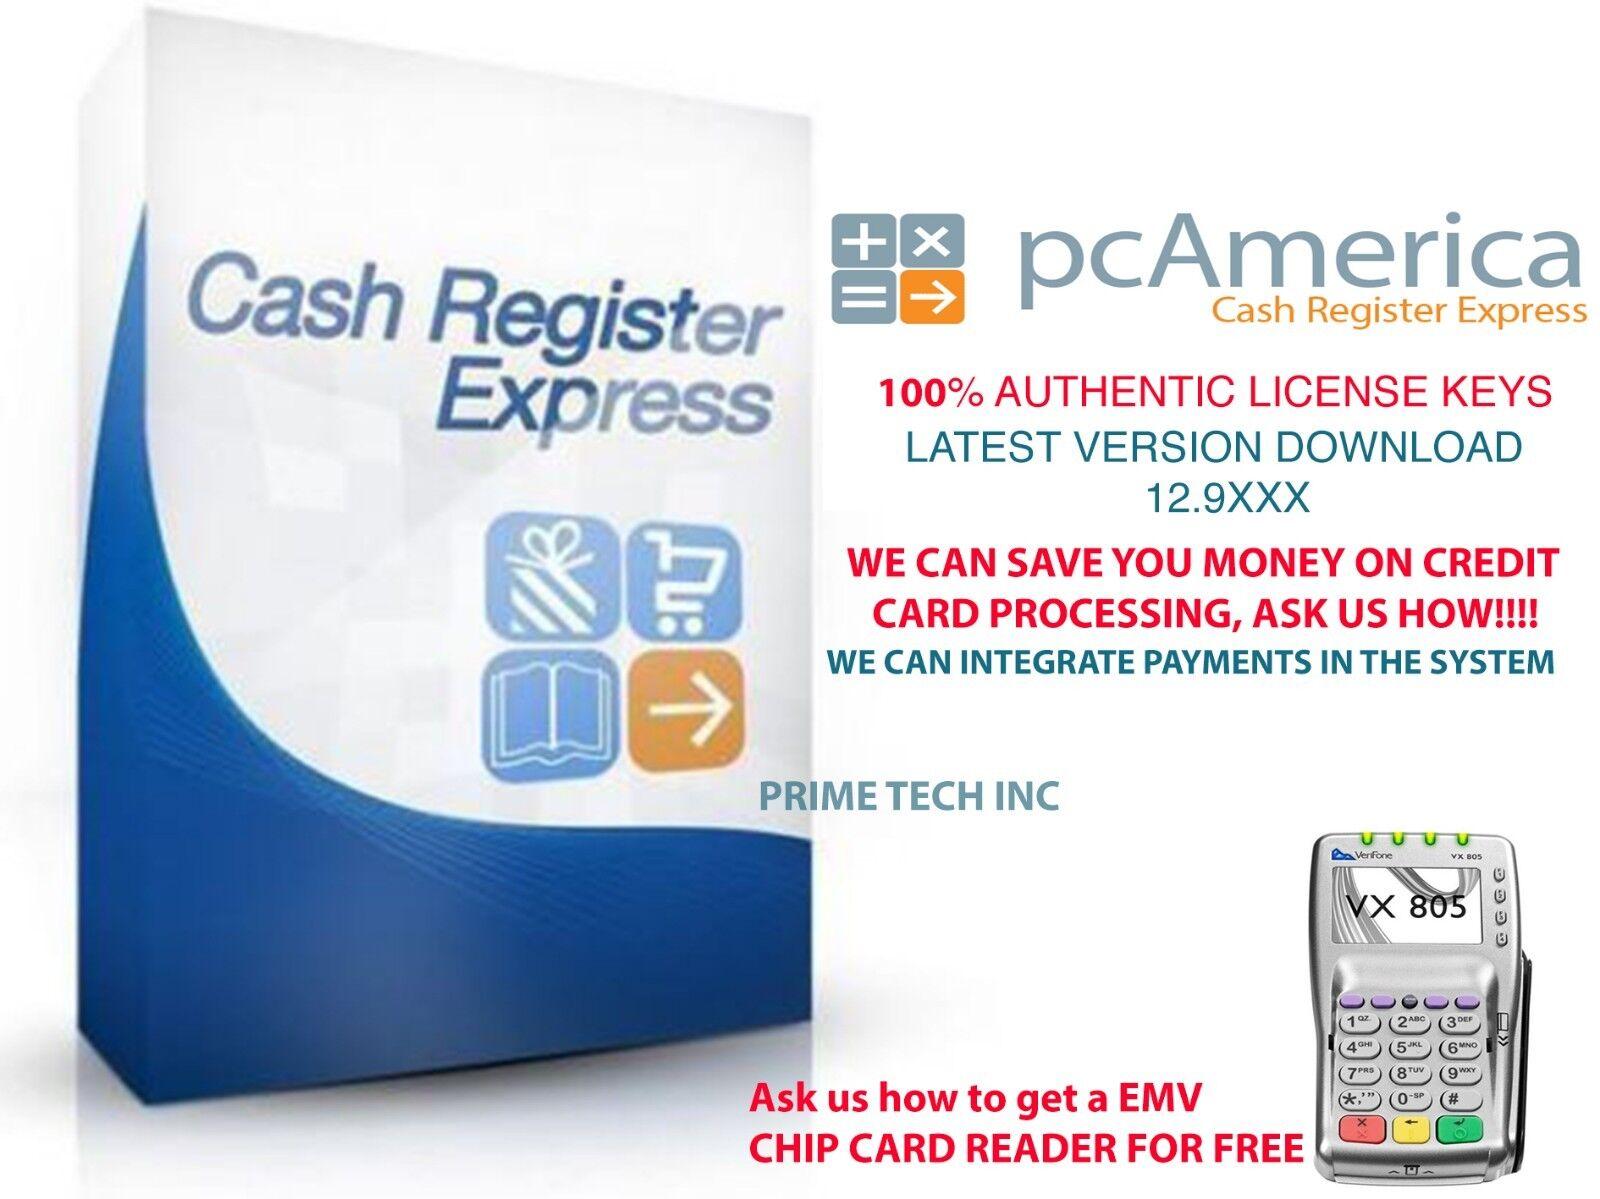 Cash Register Express LATEST VERSION 12.9XXX   CRE PROFESSIO